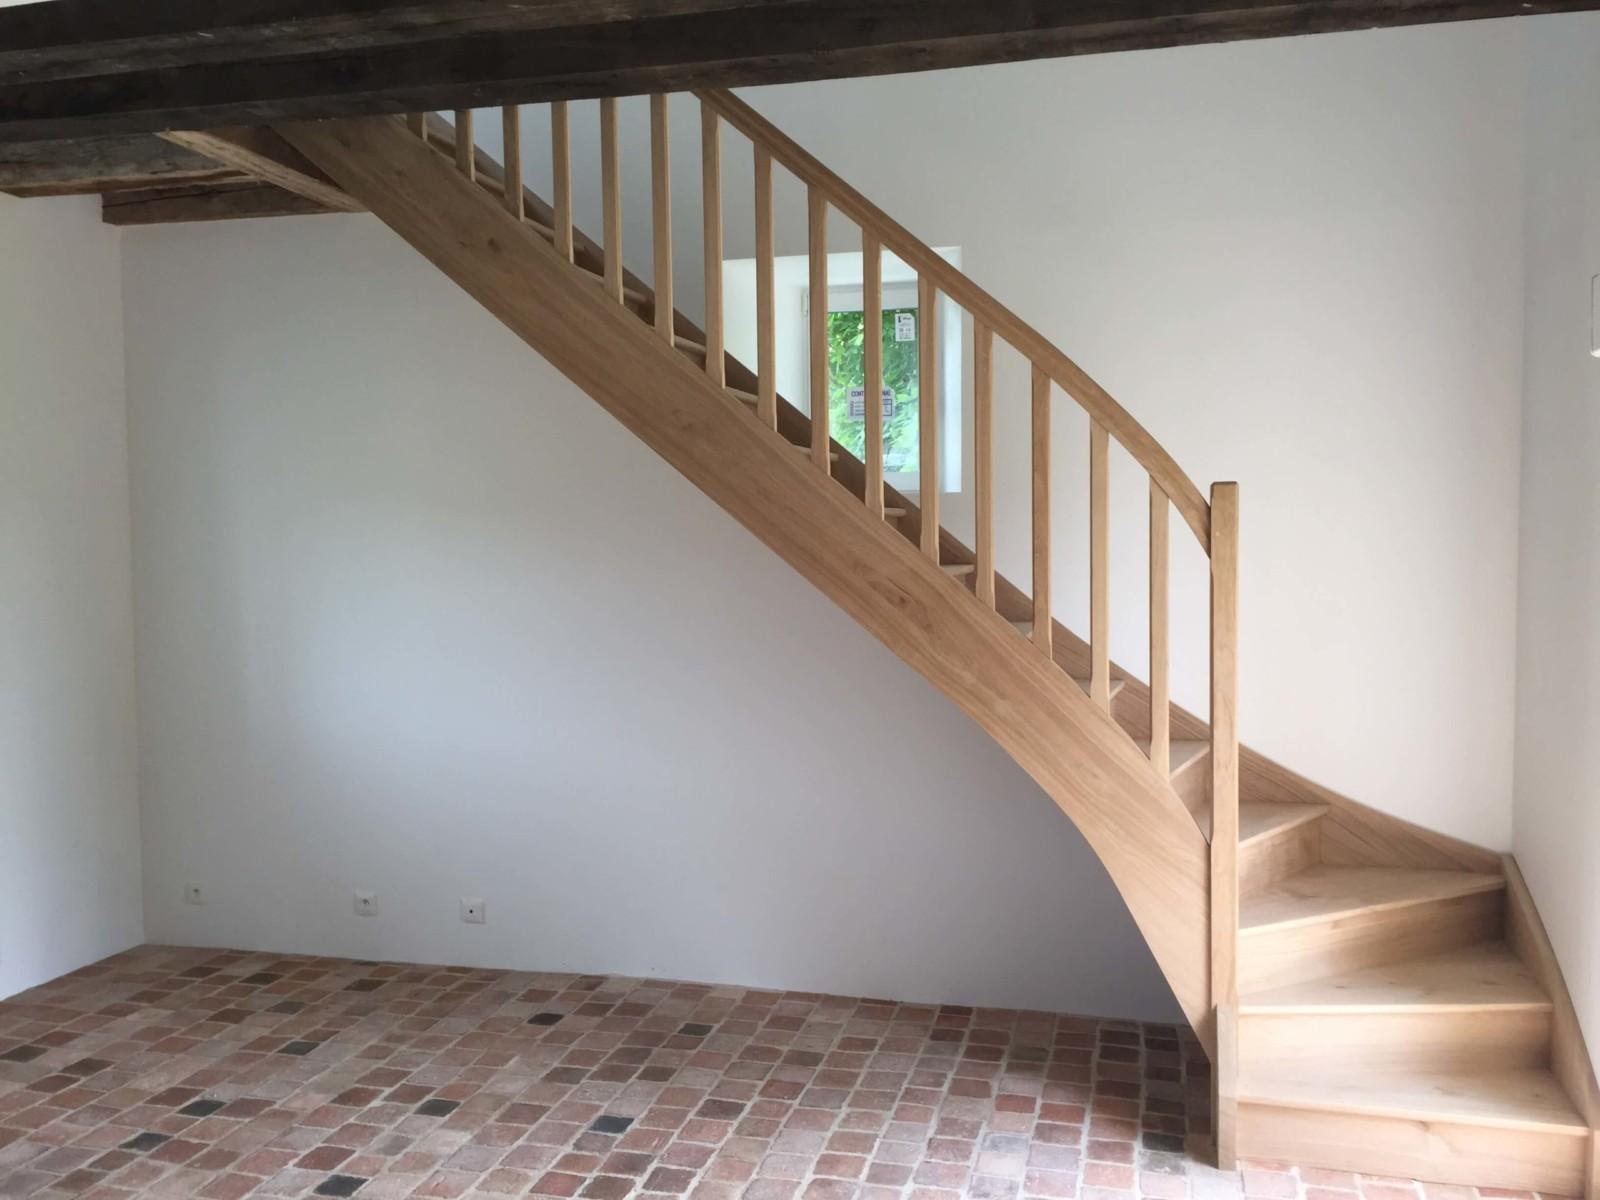 REGIS BERTHELOT Fabricant Escaliers Longue Jumelles IMG 0900